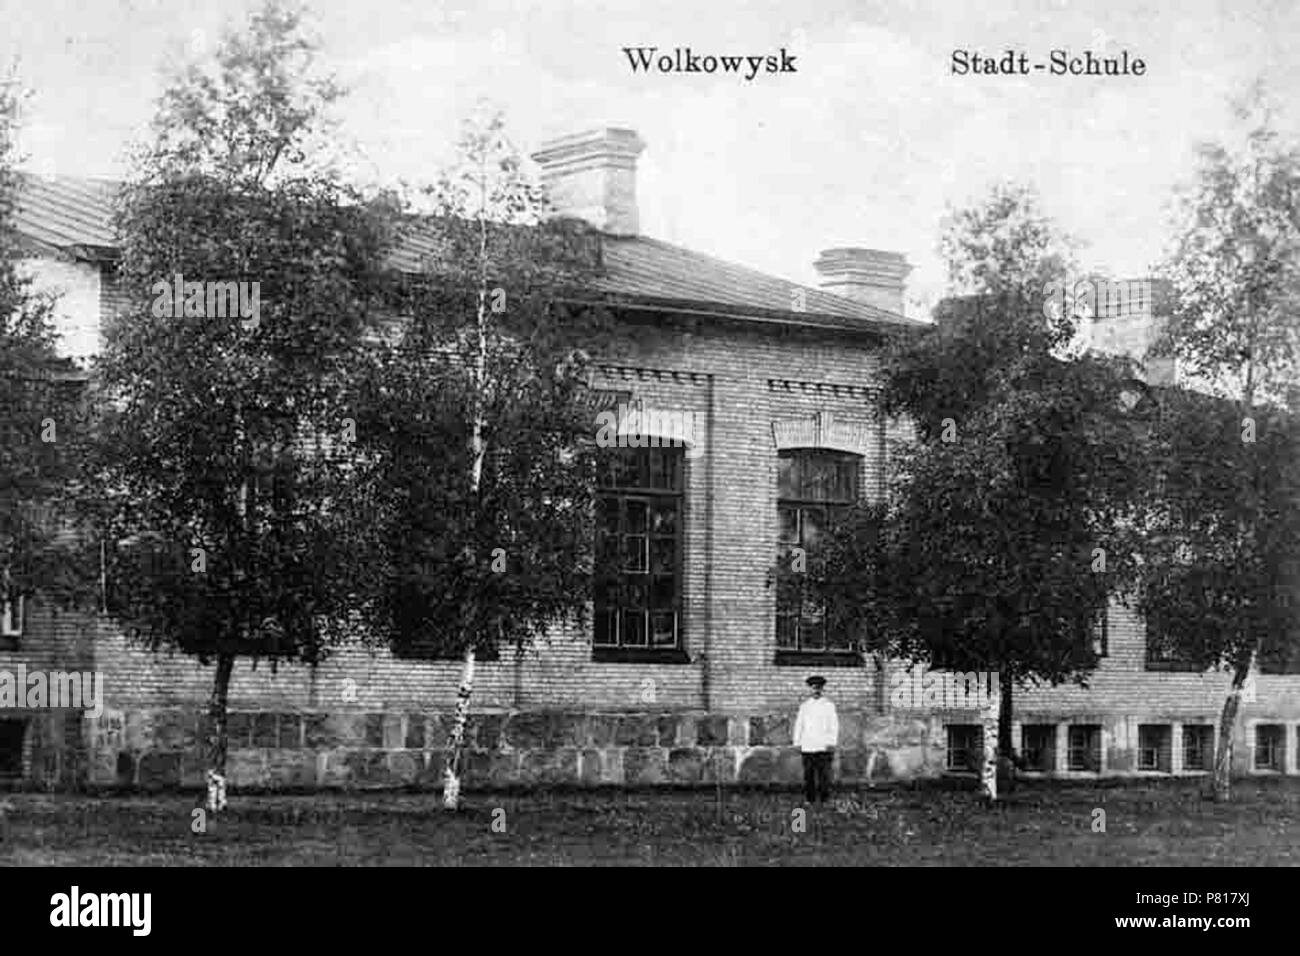 385 Vaŭkavysk, Vola. Ваўкавыск, Воля (1916) - Stock Image